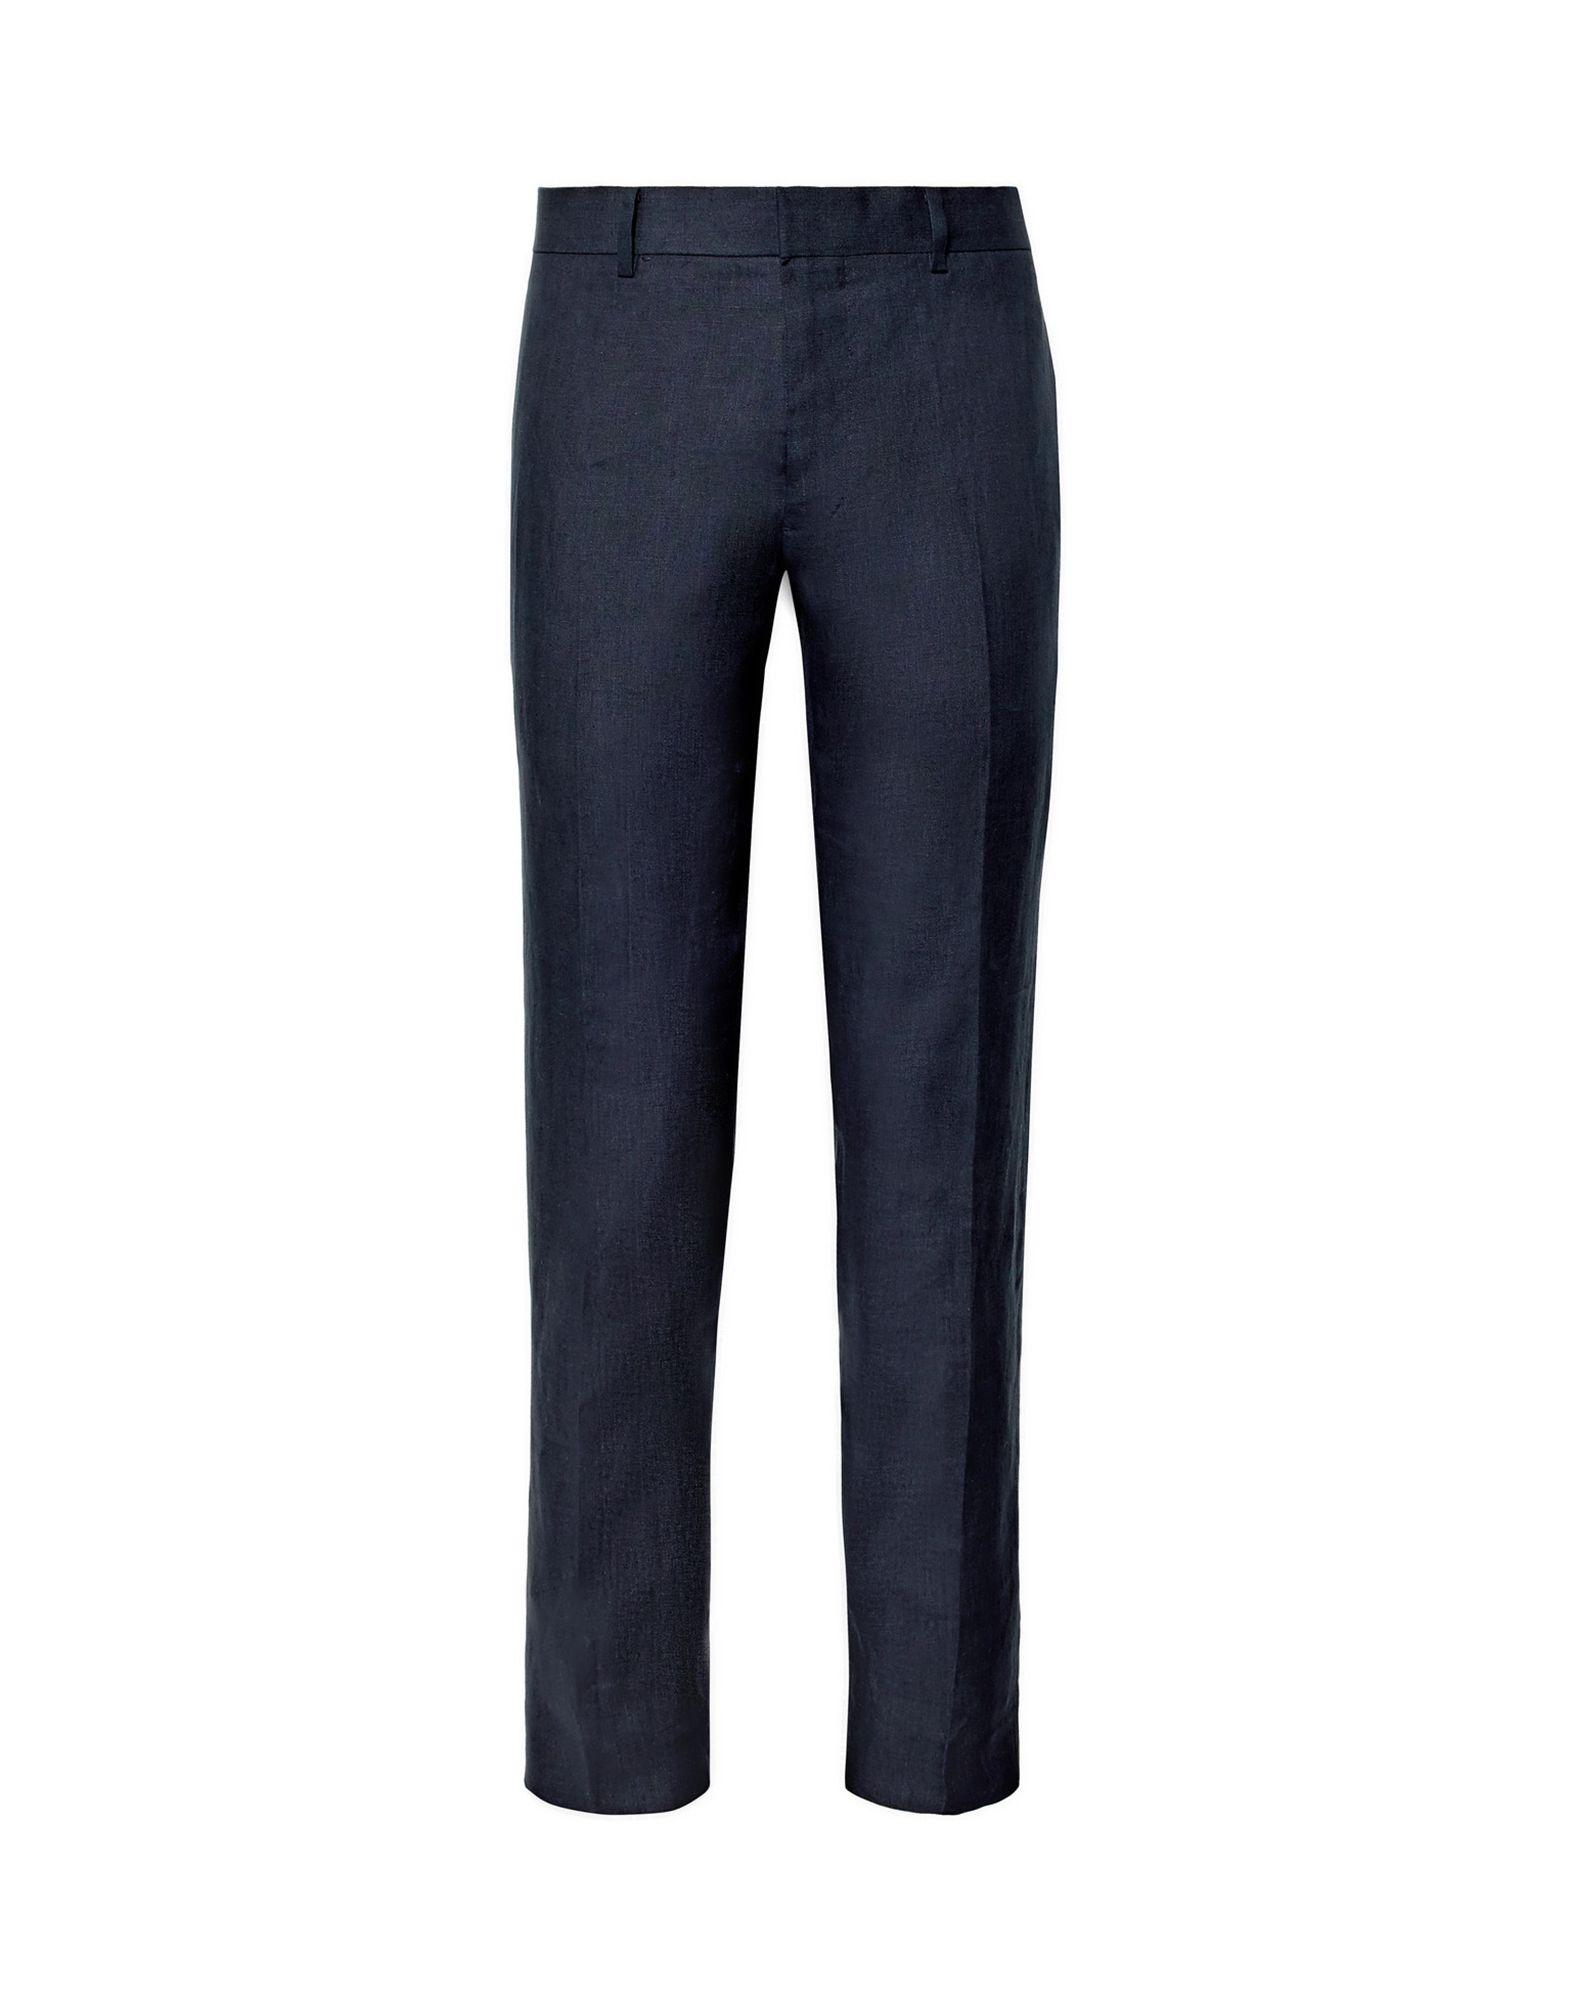 CLUB MONACO Casual pants. plain weave, basic solid color, no appliqués, mid rise, regular fit, tapered leg, hook-and-bar, zip, multipockets. 100% Linen